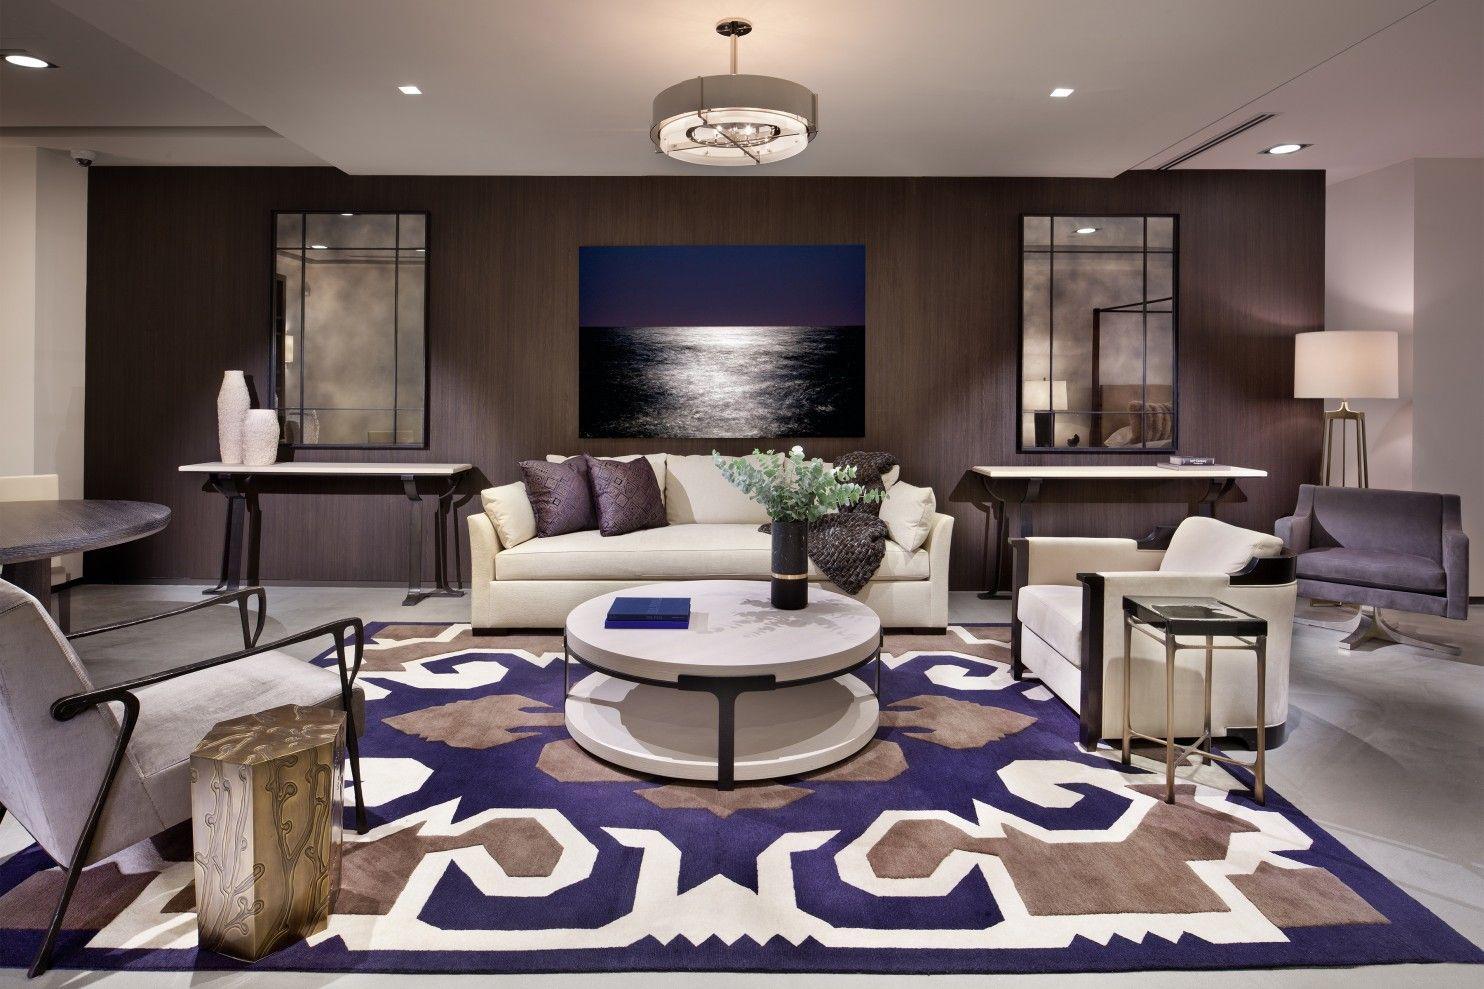 Pin By Gorgi Jurukovski On Living Aesthetics Tyle Interior Architecture House Interior House Design